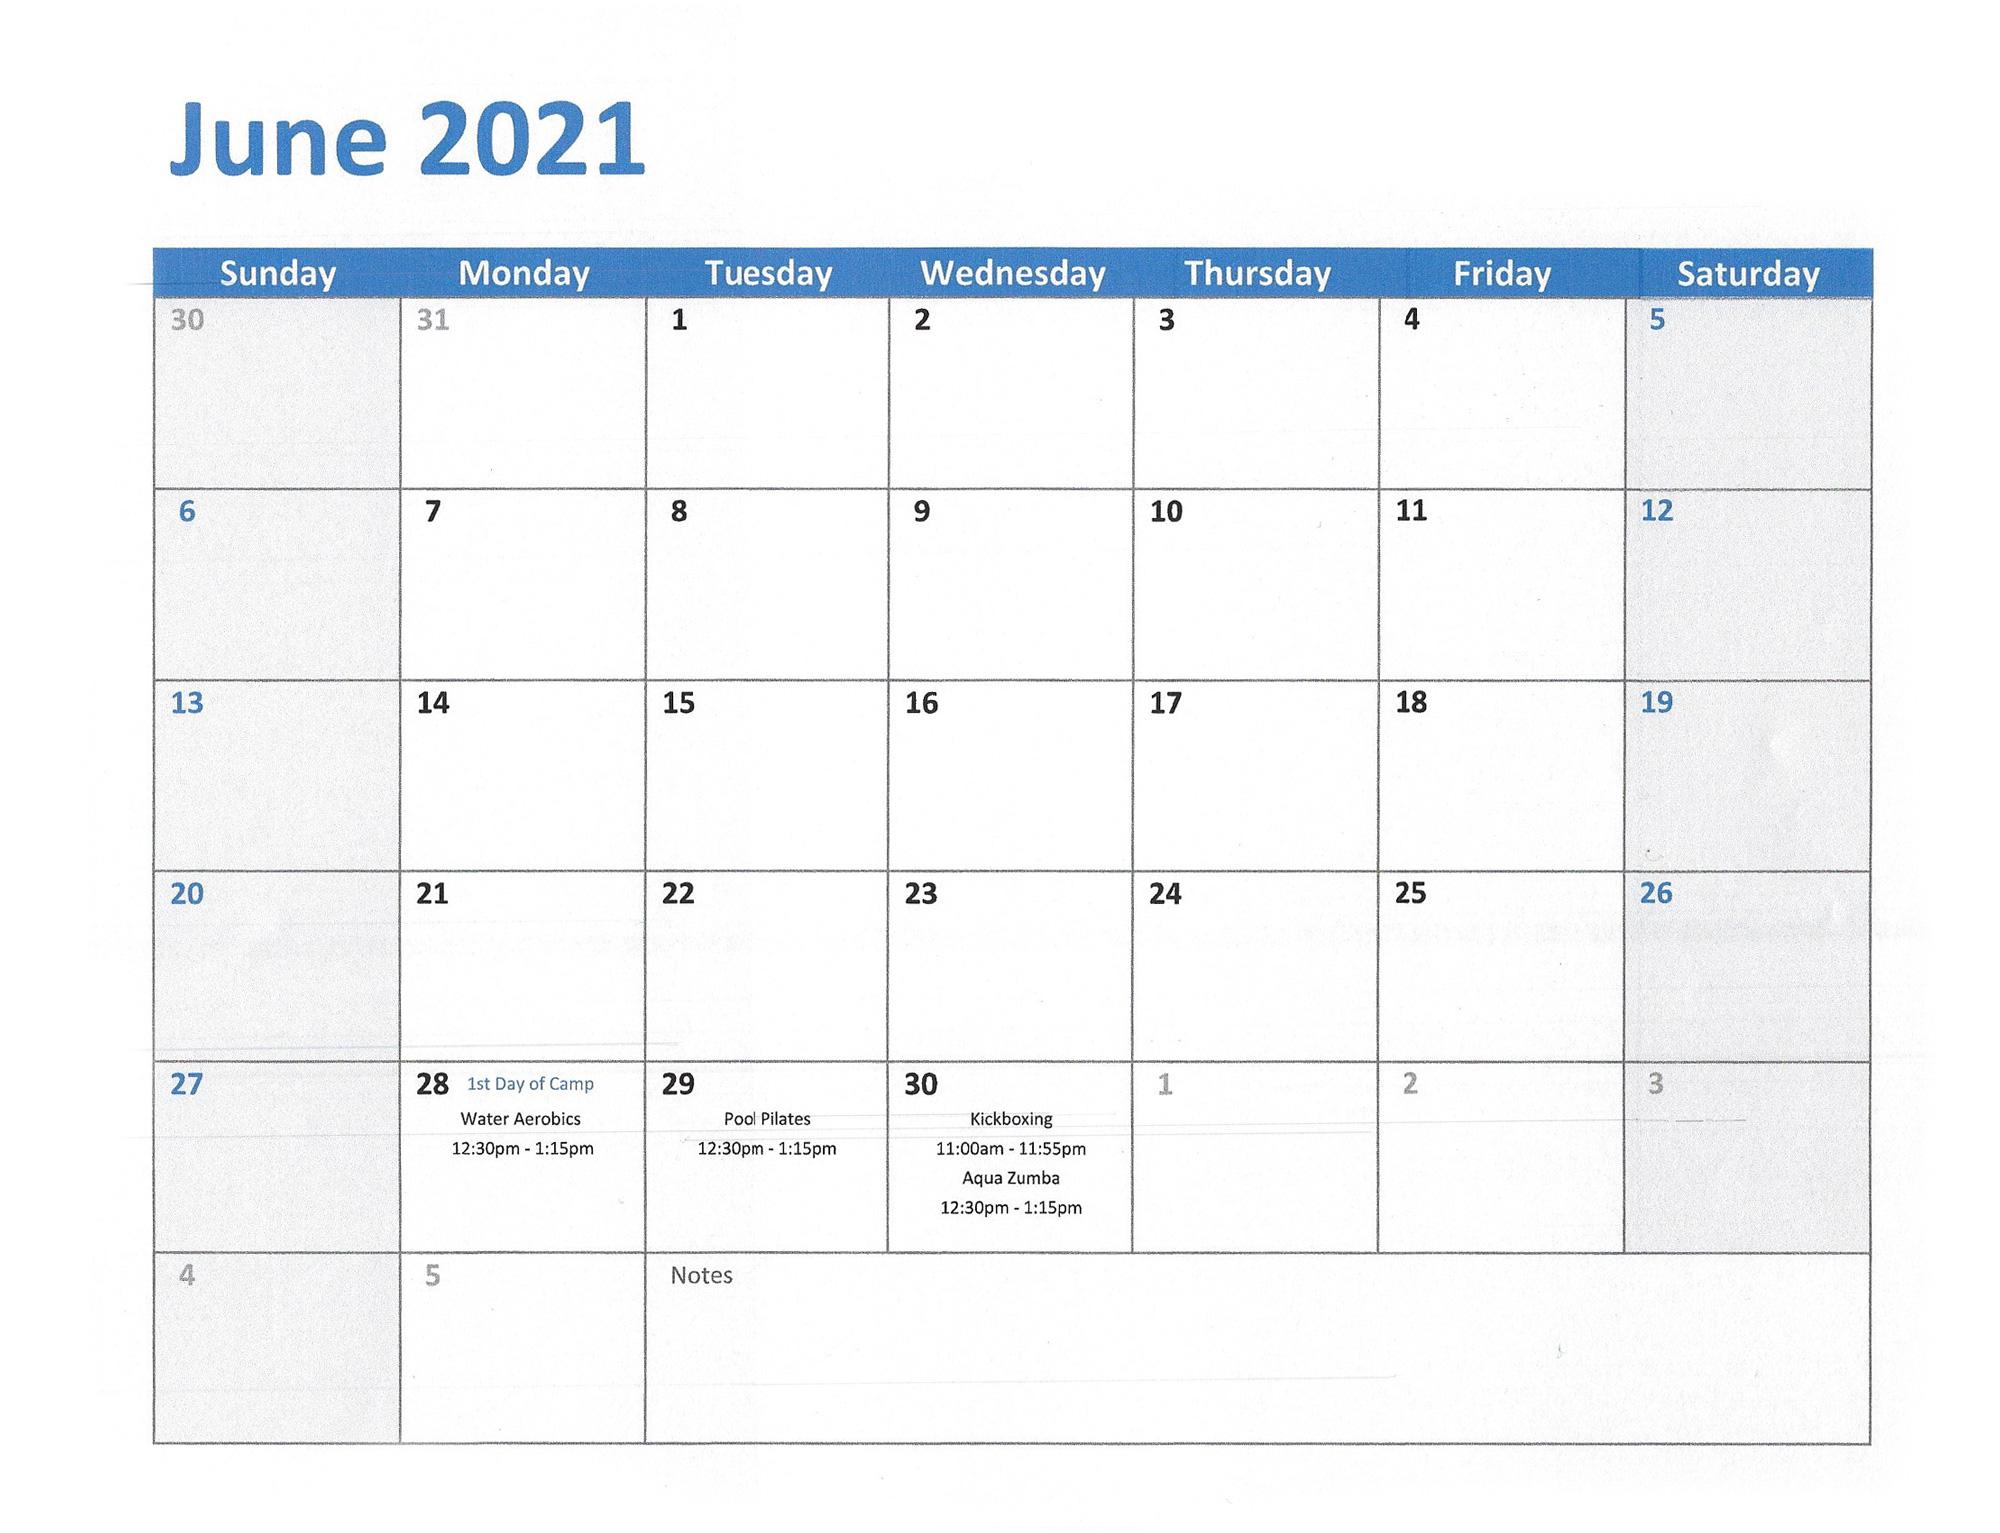 June-21-calendar-of-events